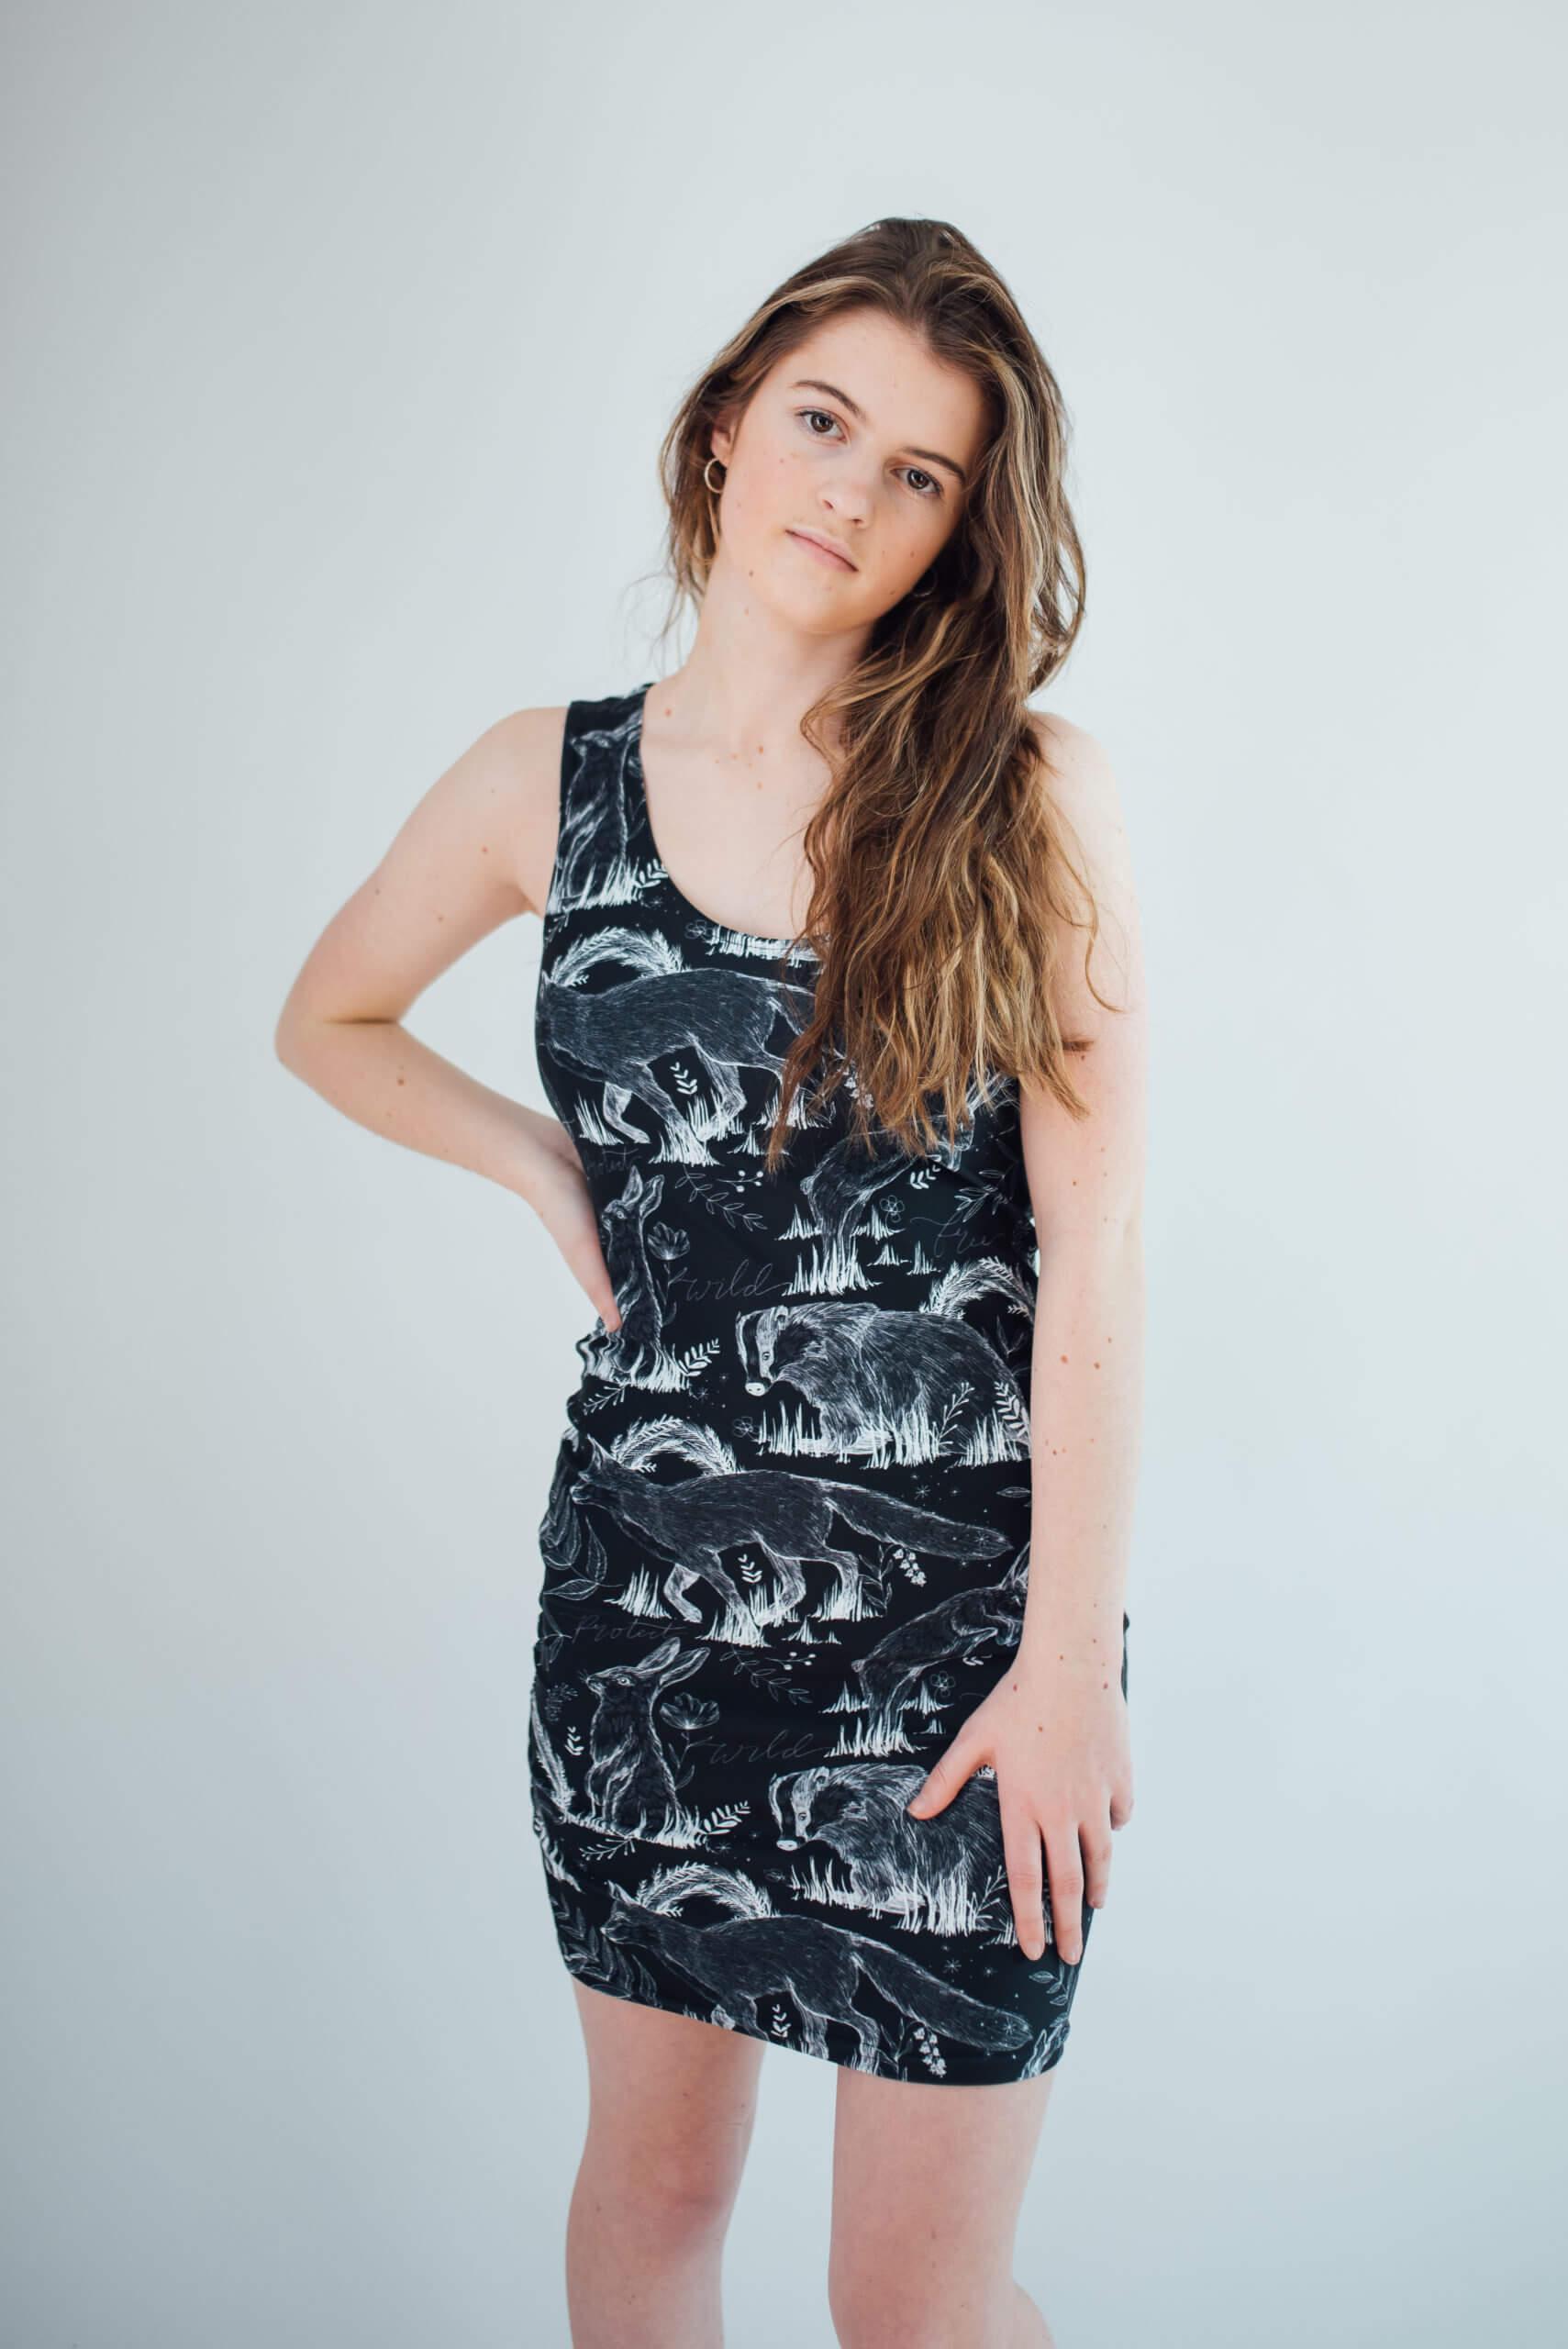 Vegan Model Angel wearing all over print wildlife dress